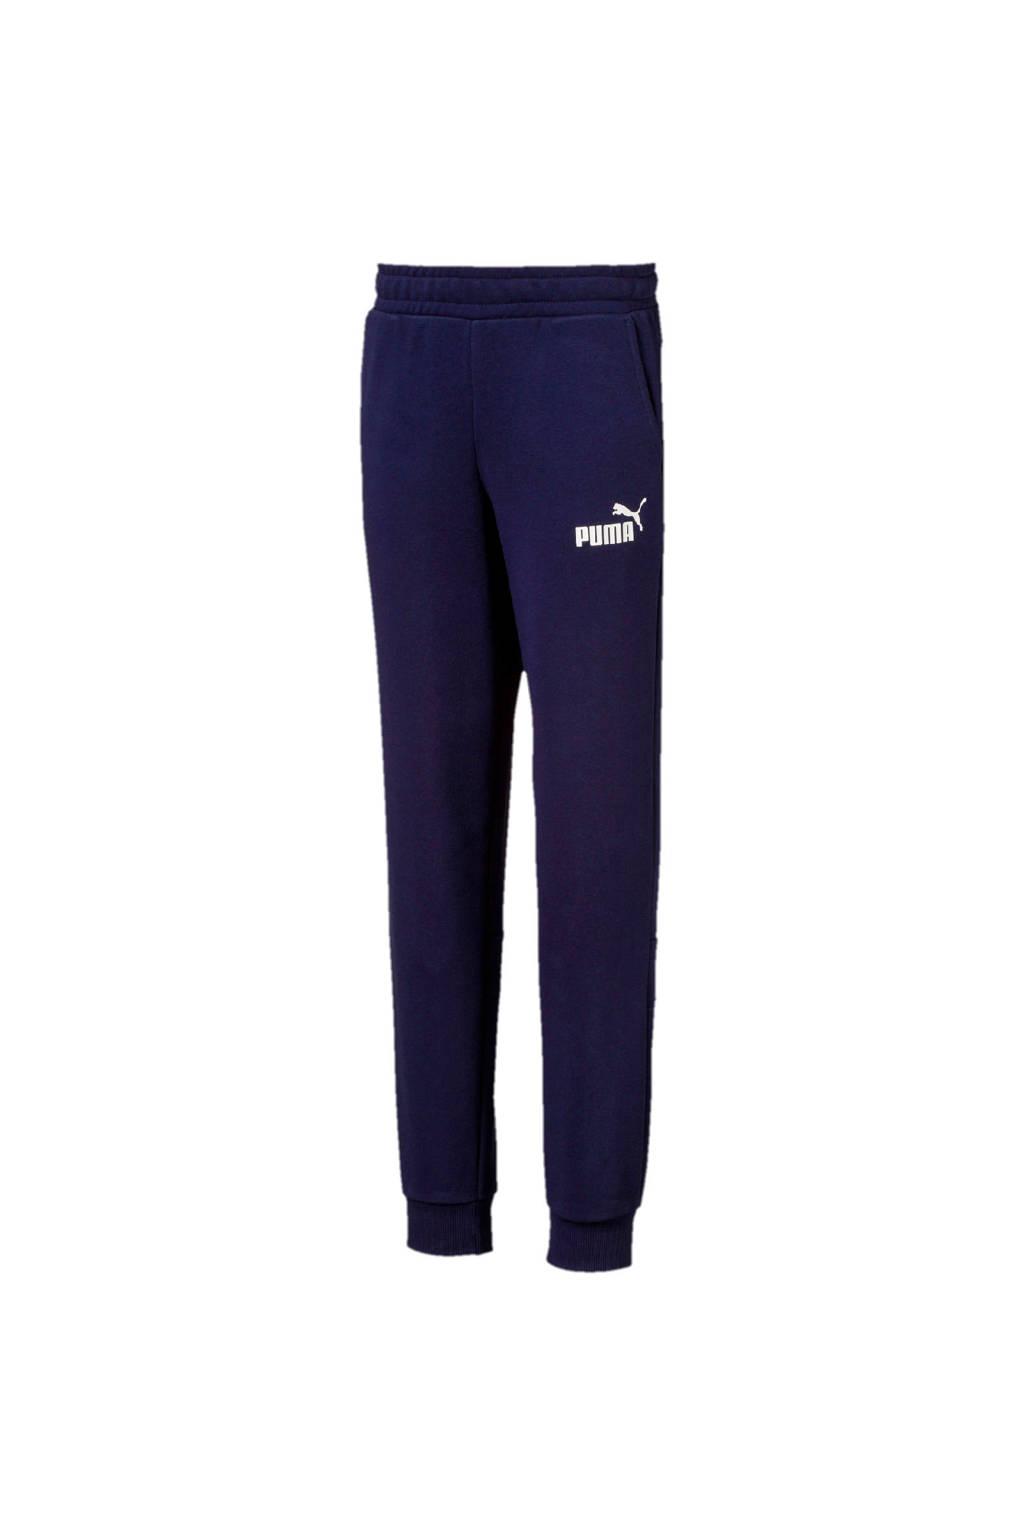 Puma   joggingbroek donkerblauw, Donkerblauw/wit